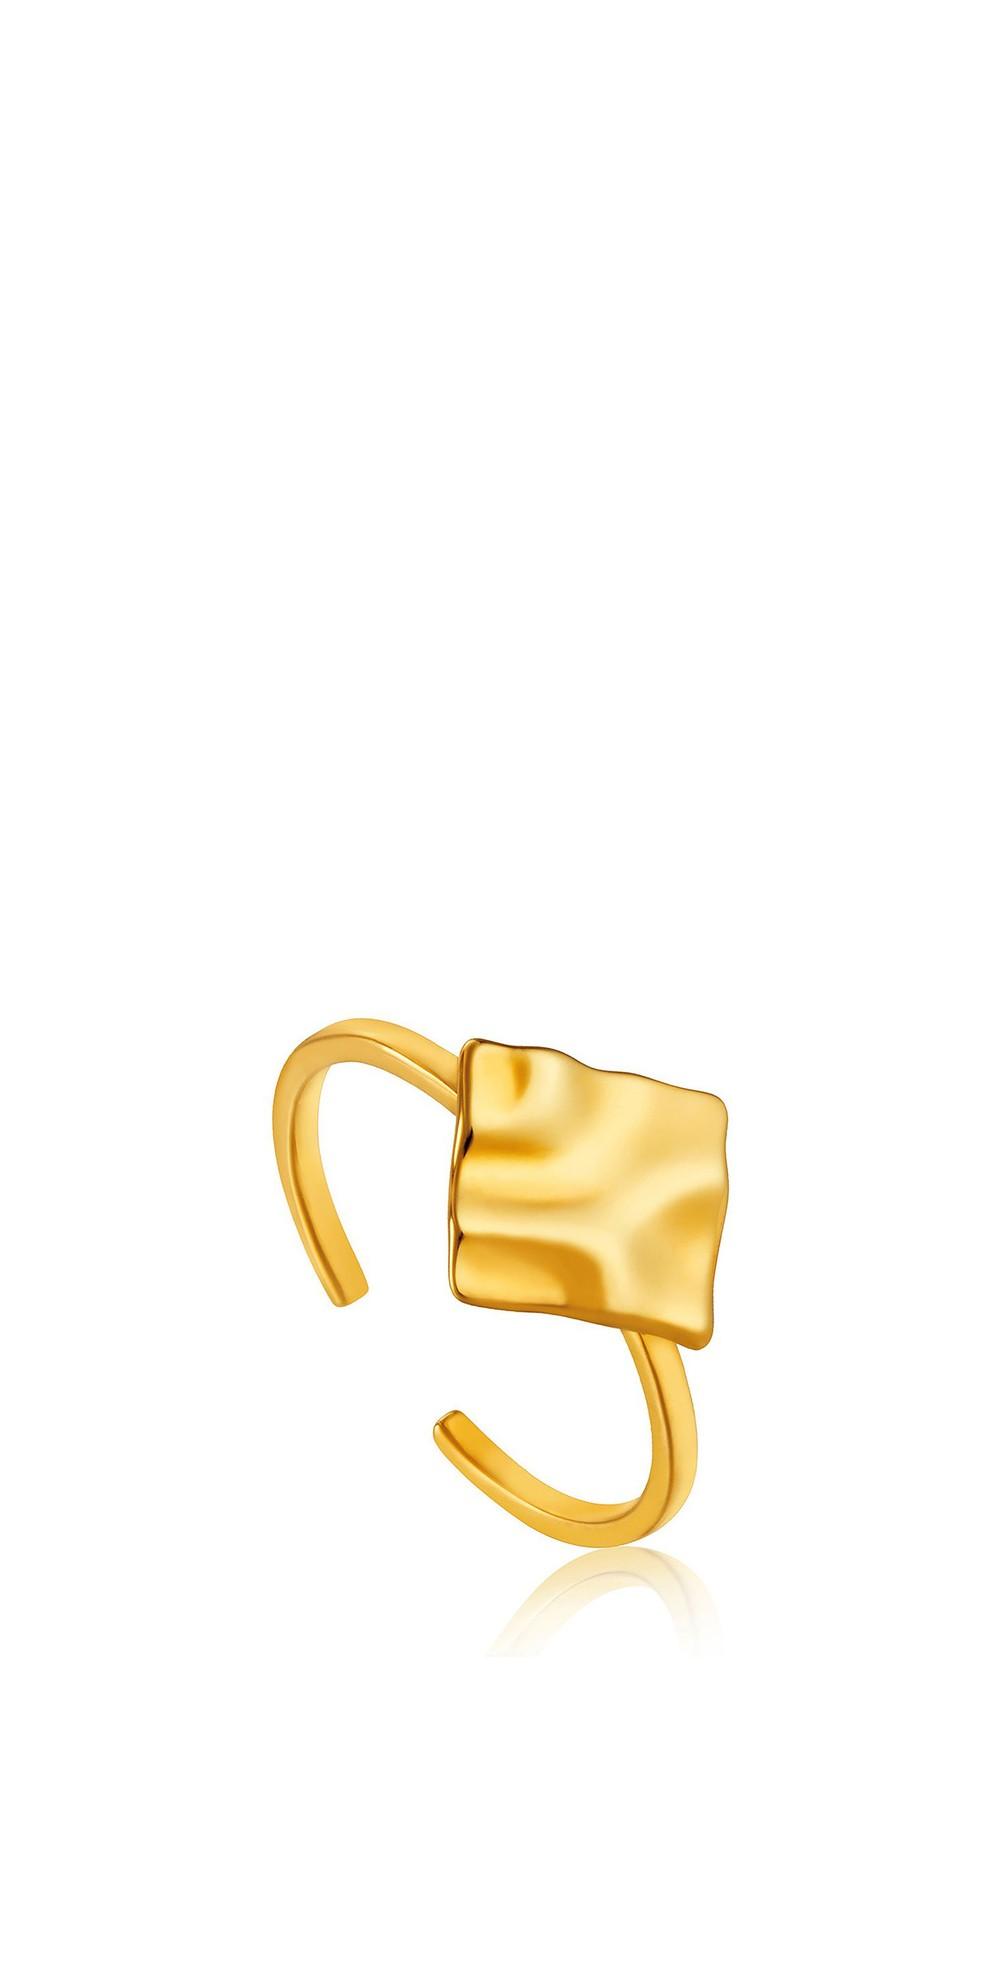 Crush Square Adjustable Ring main image